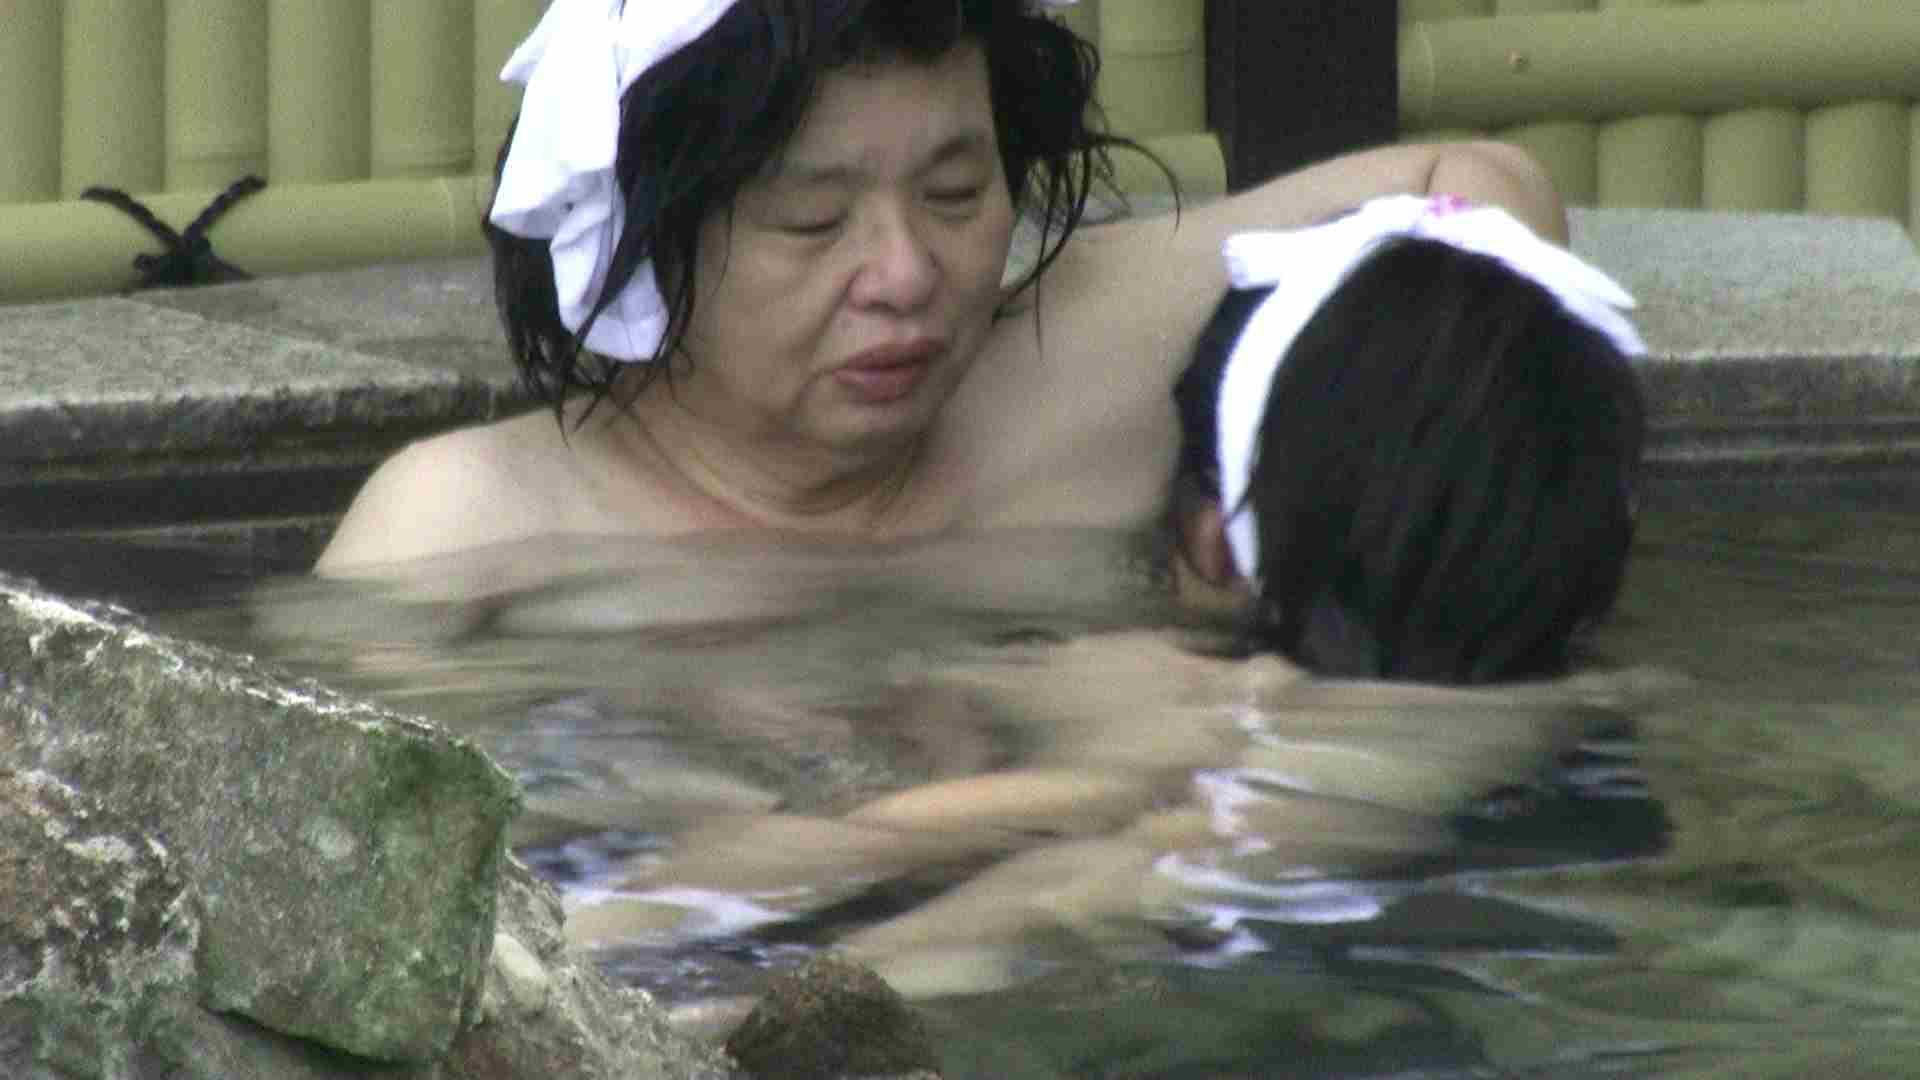 Aquaな露天風呂Vol.179 OLのエロ生活 | 露天風呂  105連発 37